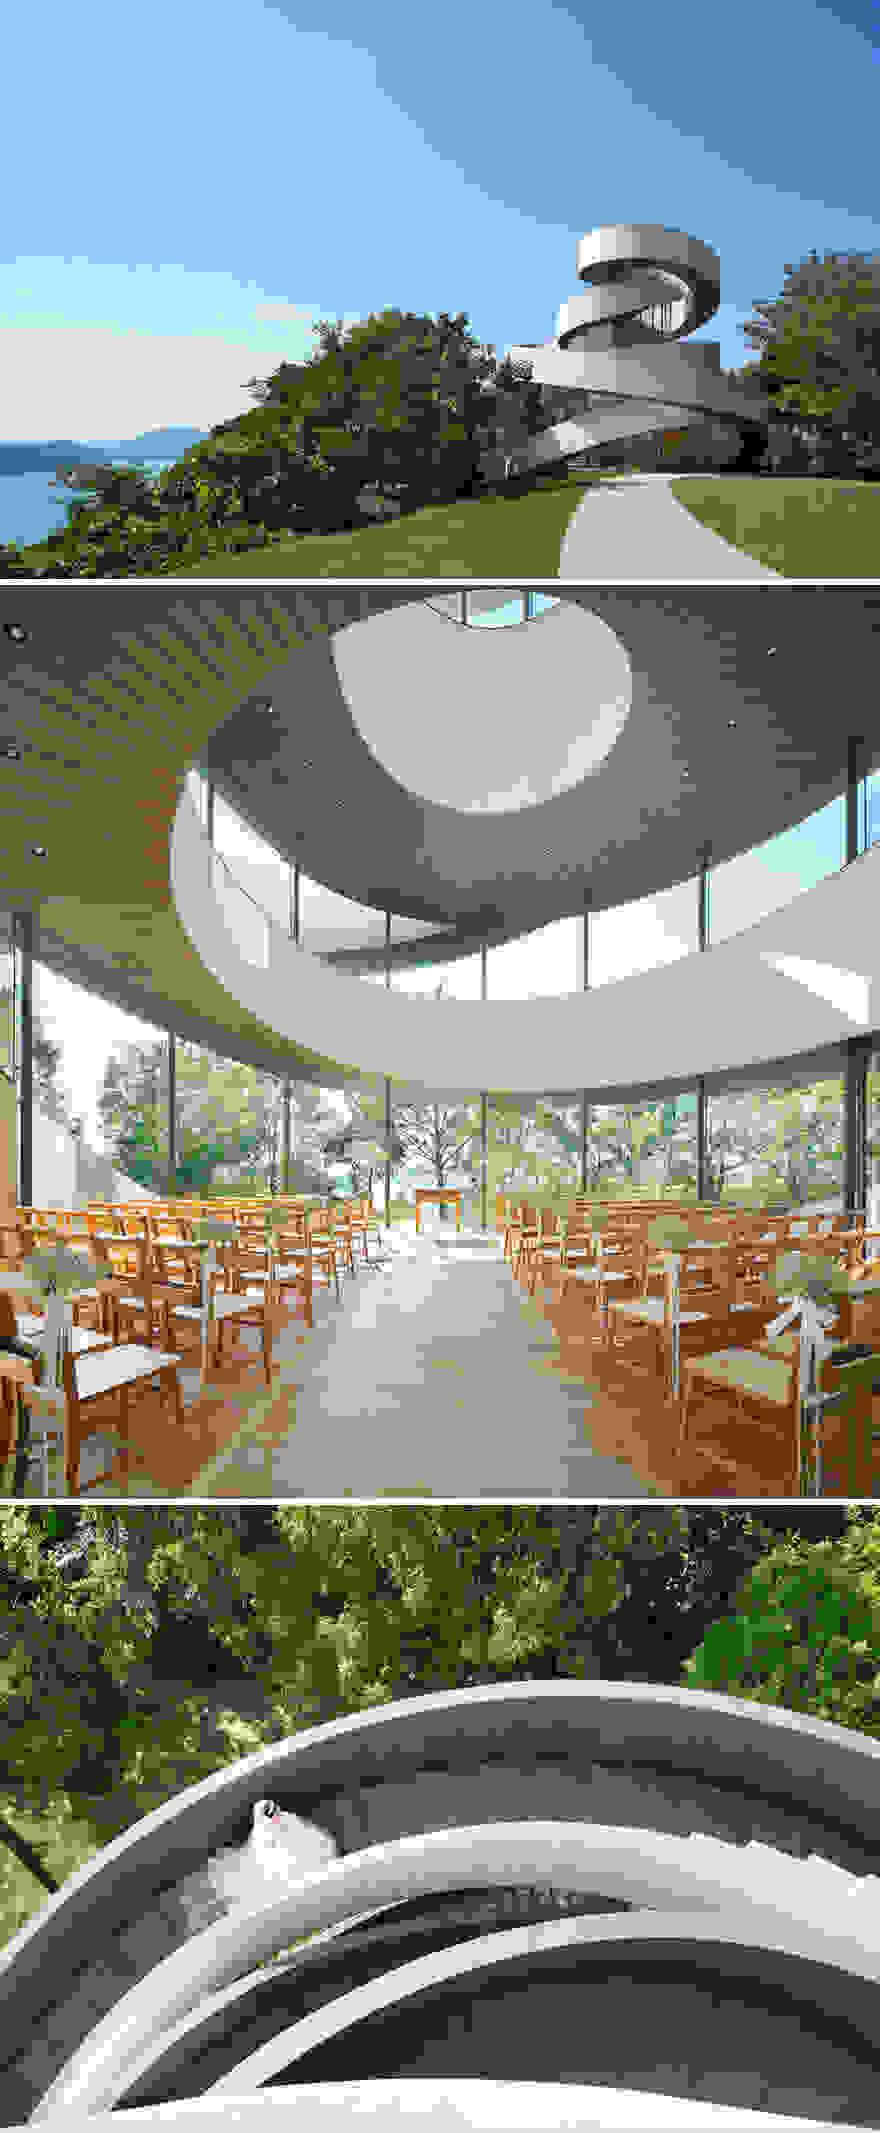 amazing-modern-japanese-architecture-15-57e256b2a856c__880.jpg